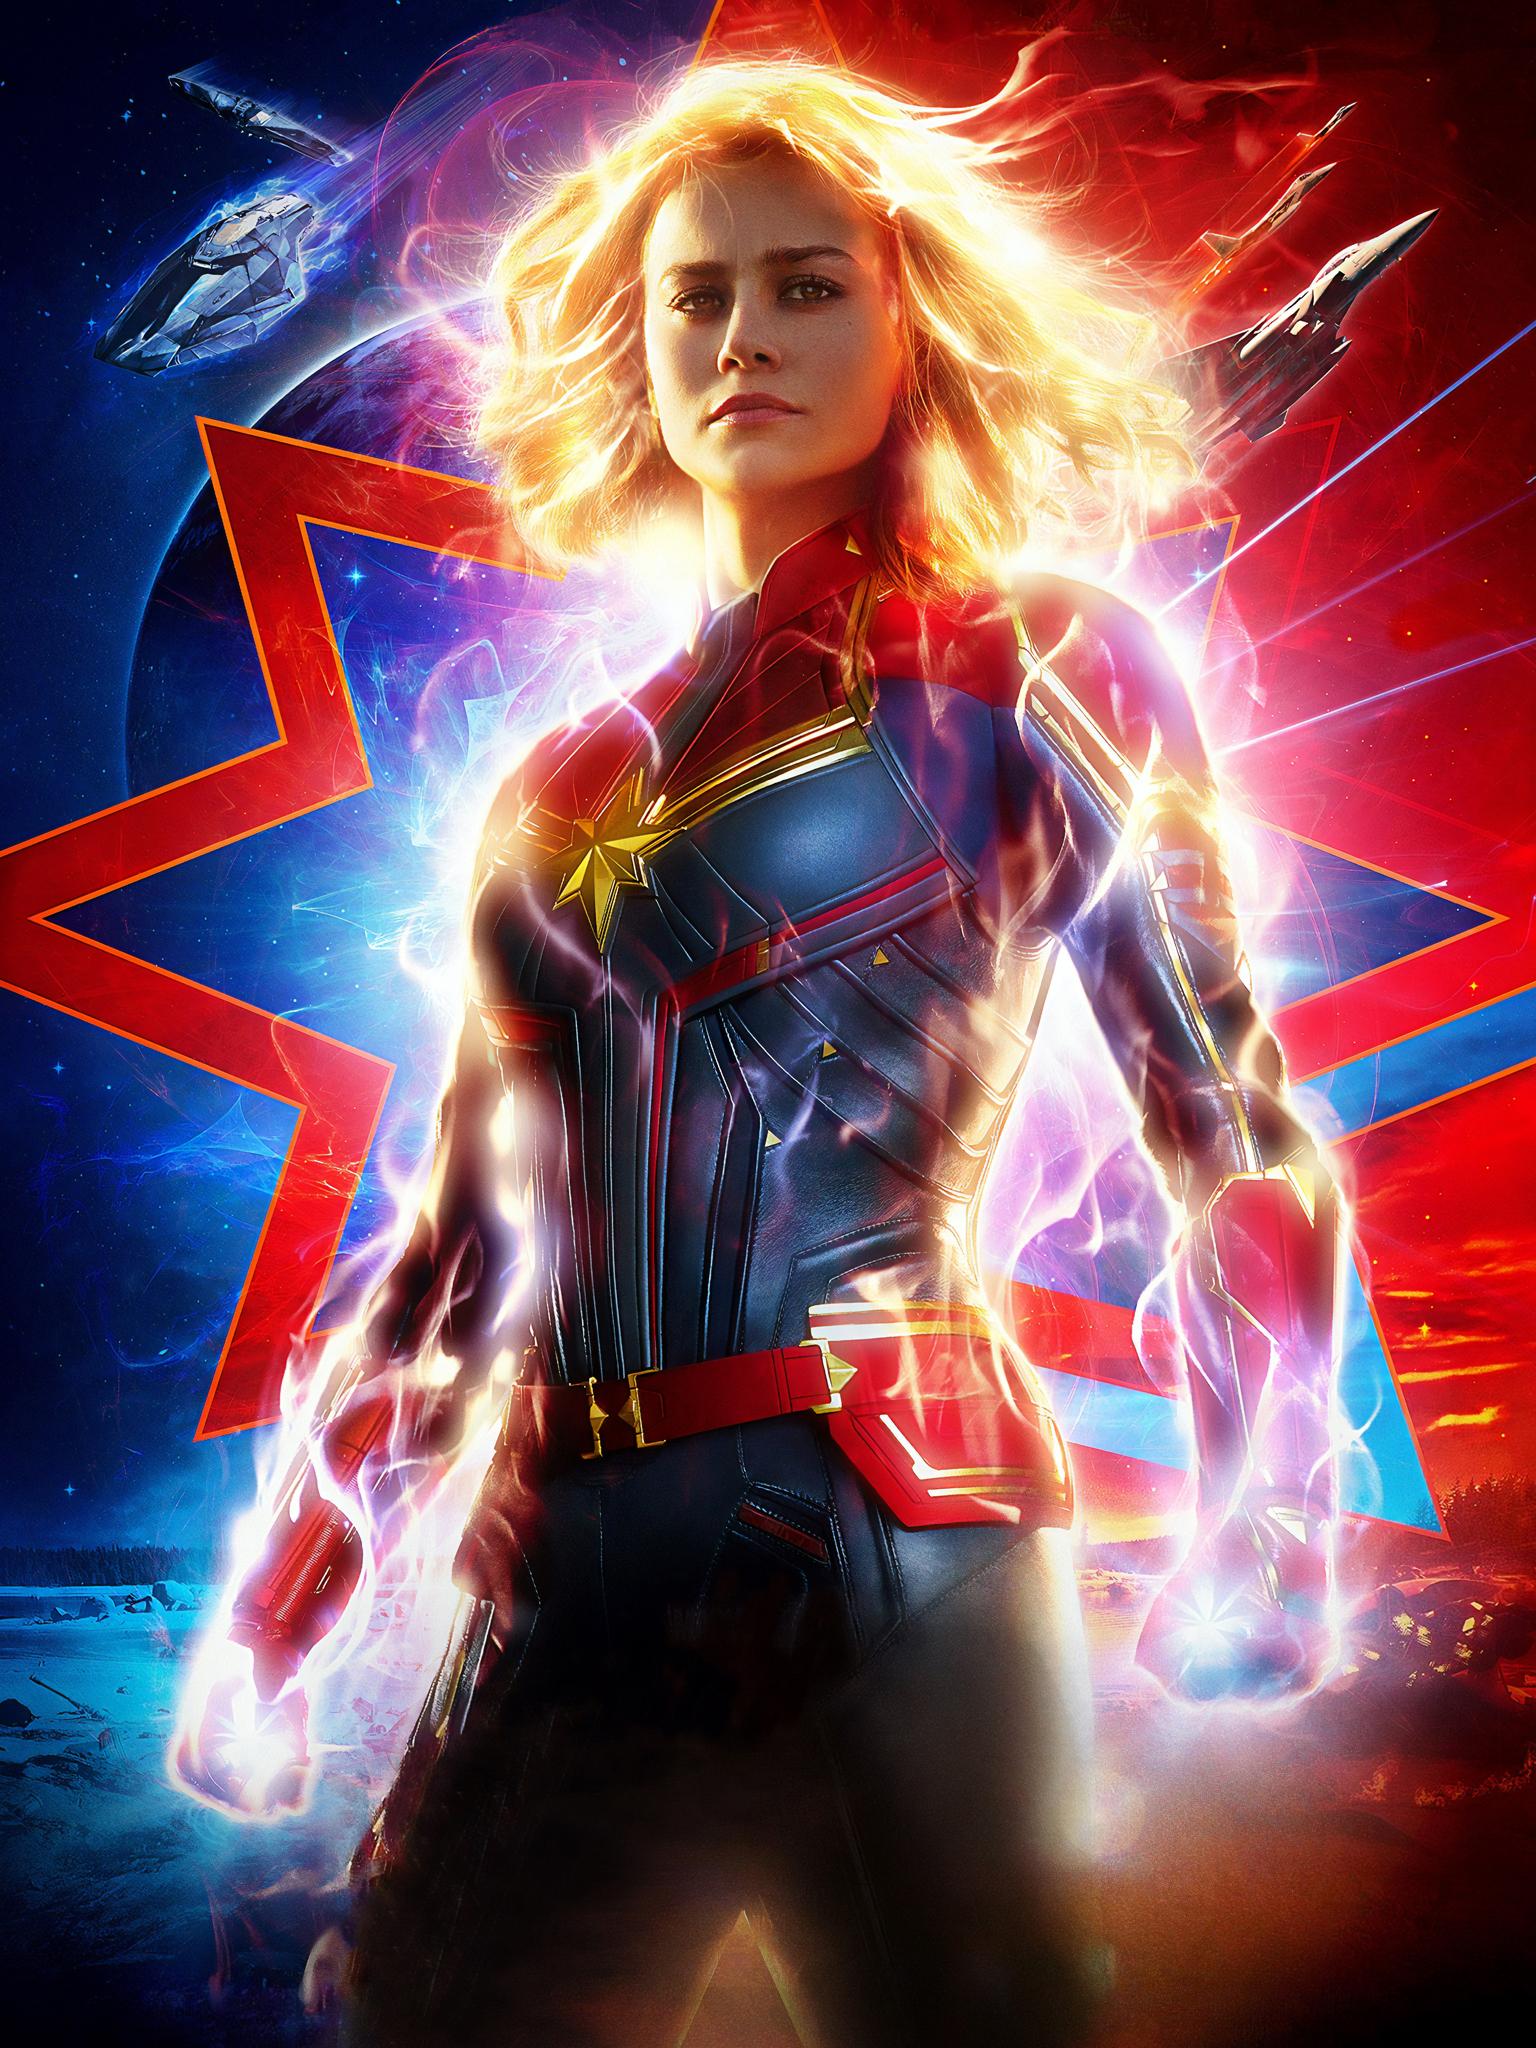 General 1536x2048 Captain Marvel Marvel Cinematic Universe Brie Larson portrait display superheroines movies blonde